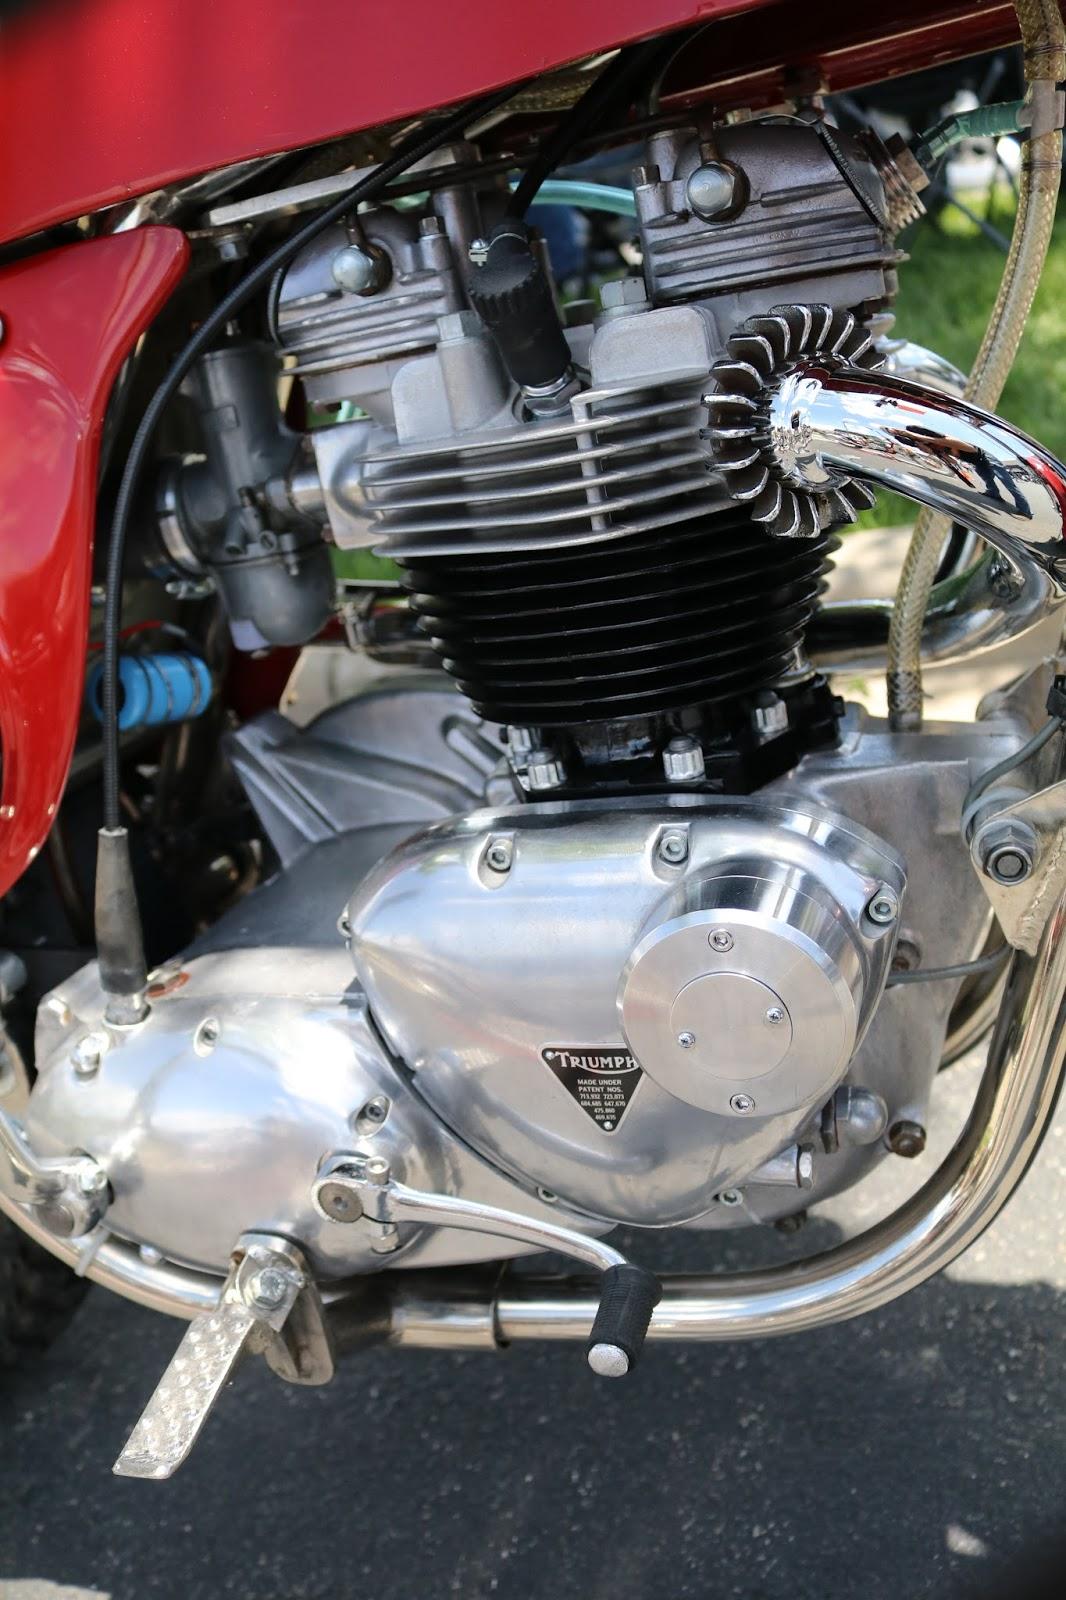 Oldmotodude 1969 Rickman Triumph On Display At The 2017